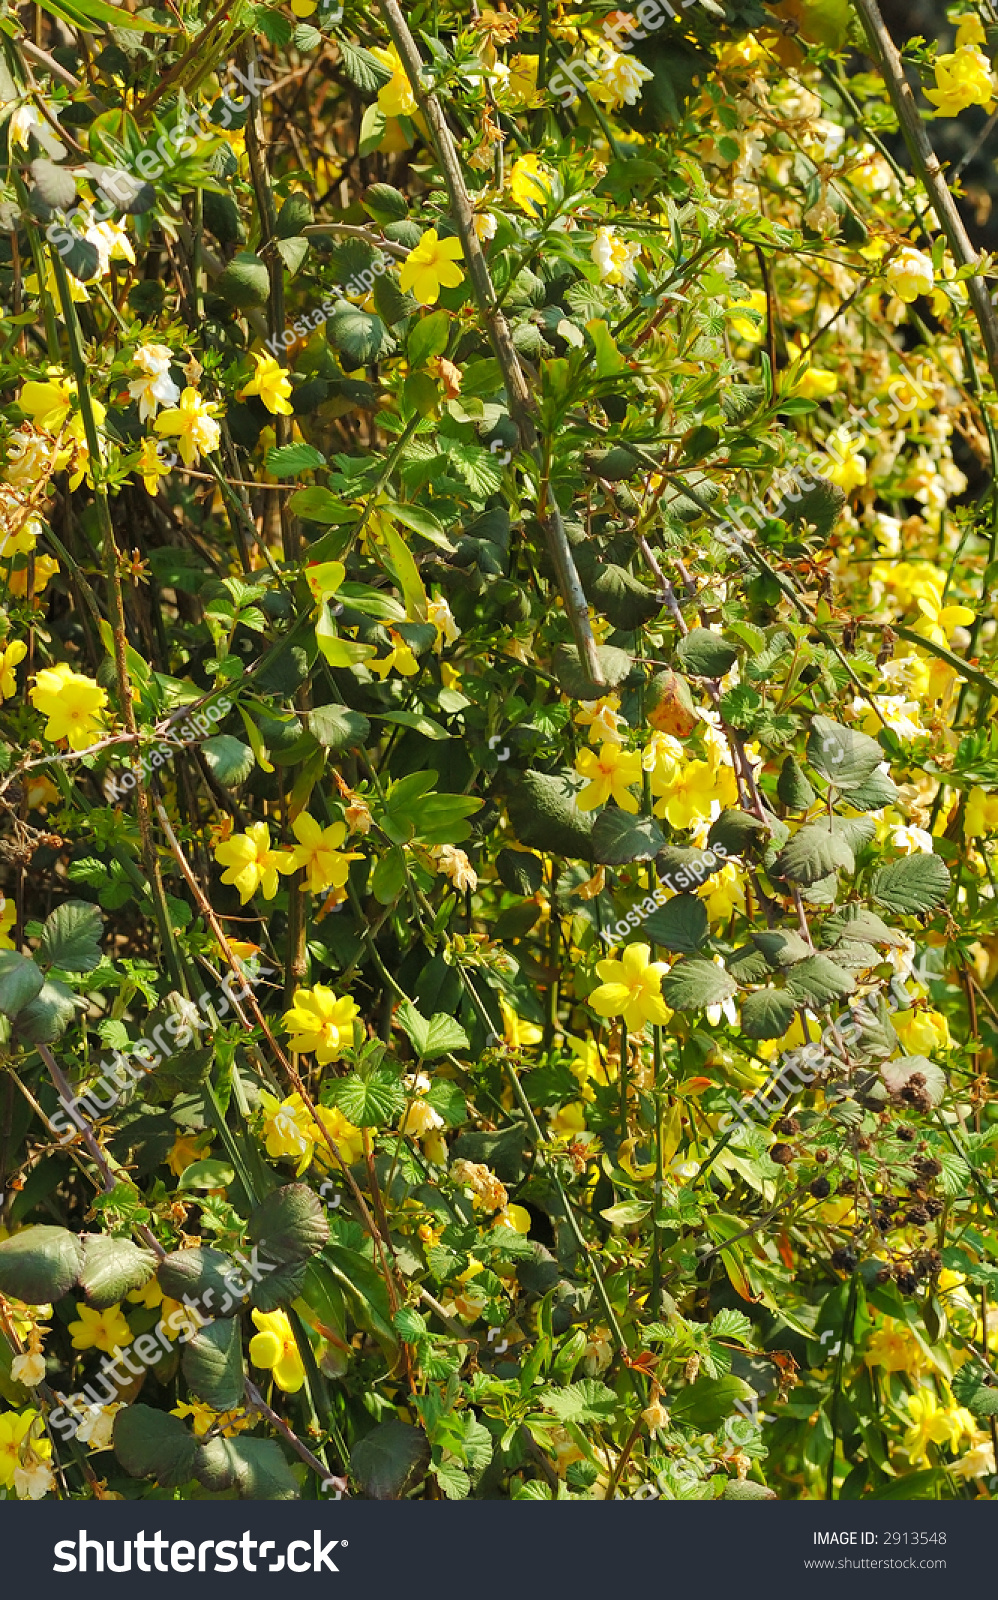 Spring Climbing Plant Yellow Flowers Stock Photo Edit Now 2913548